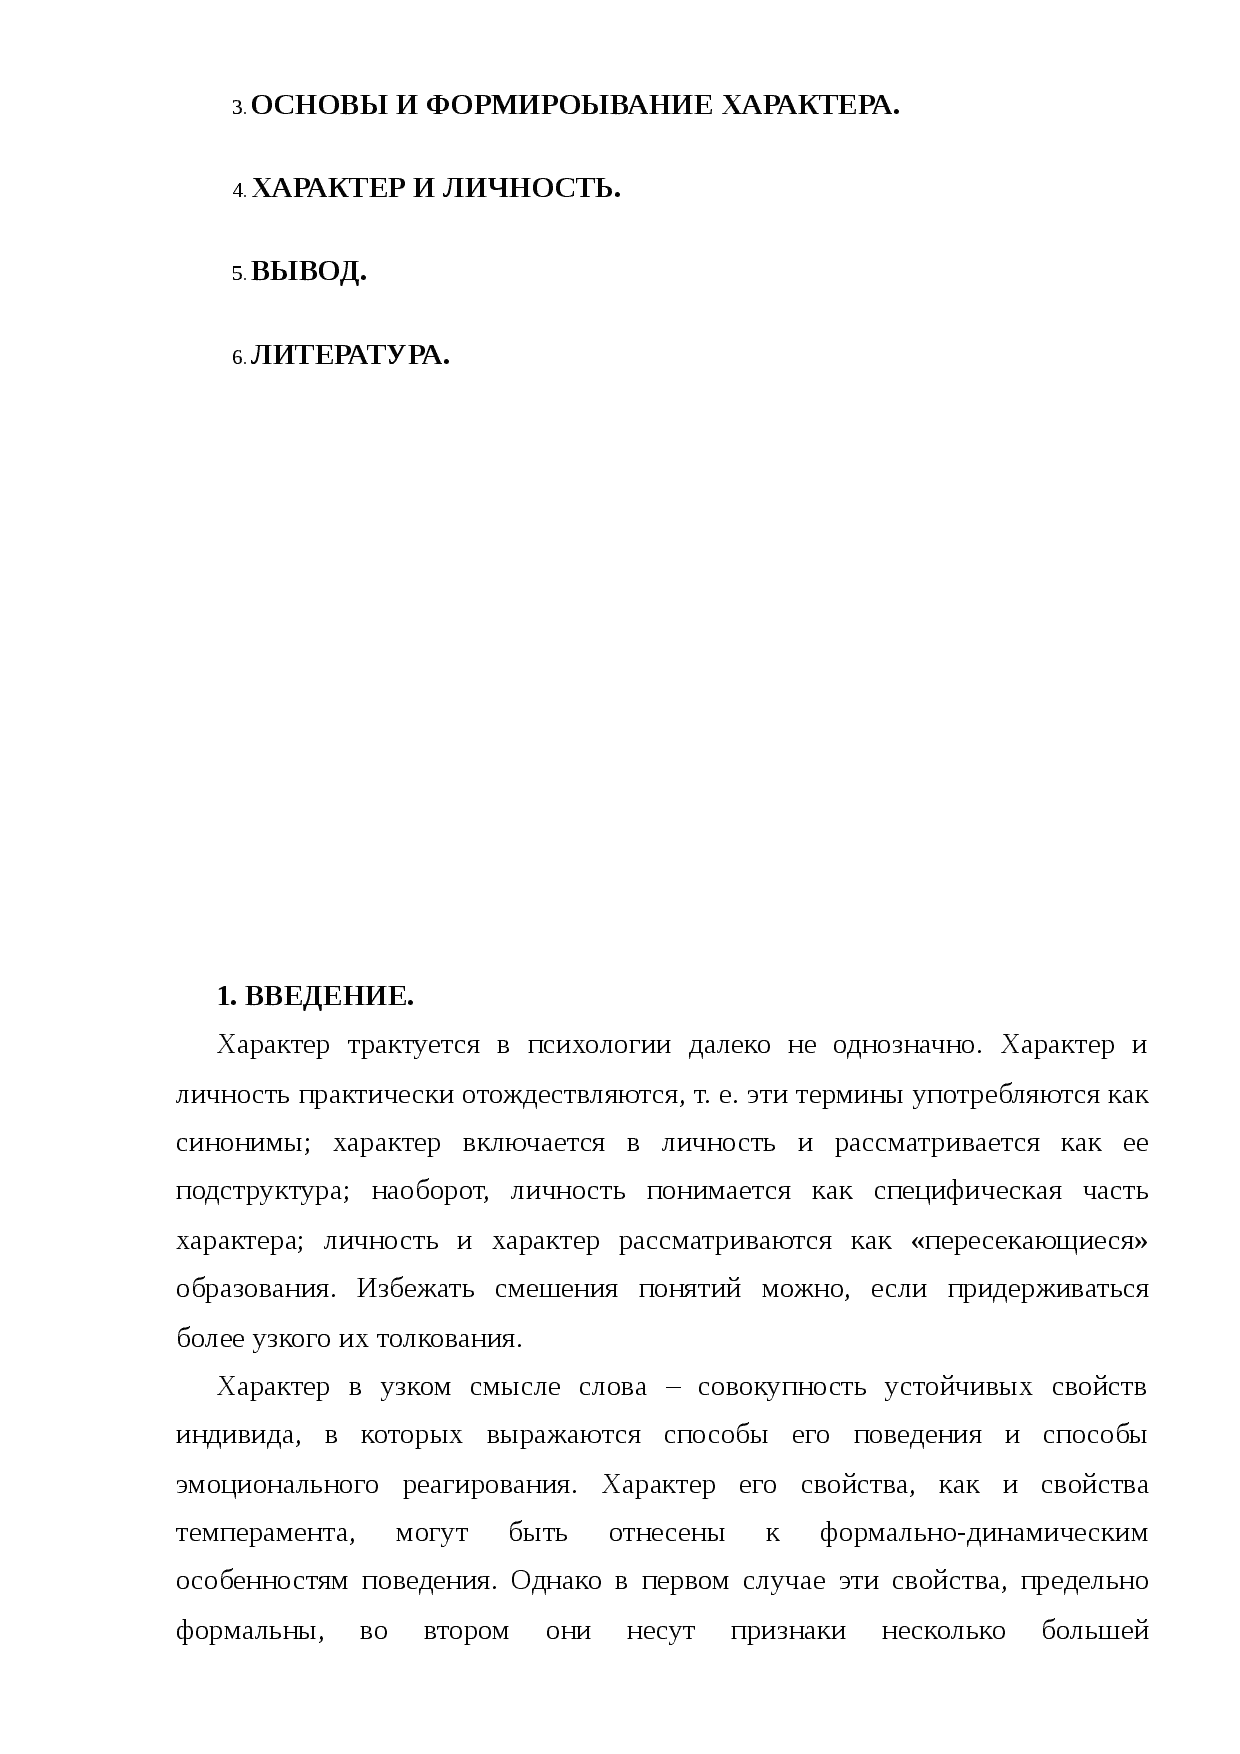 Юлия гиппенрейтер: 8 типов характера